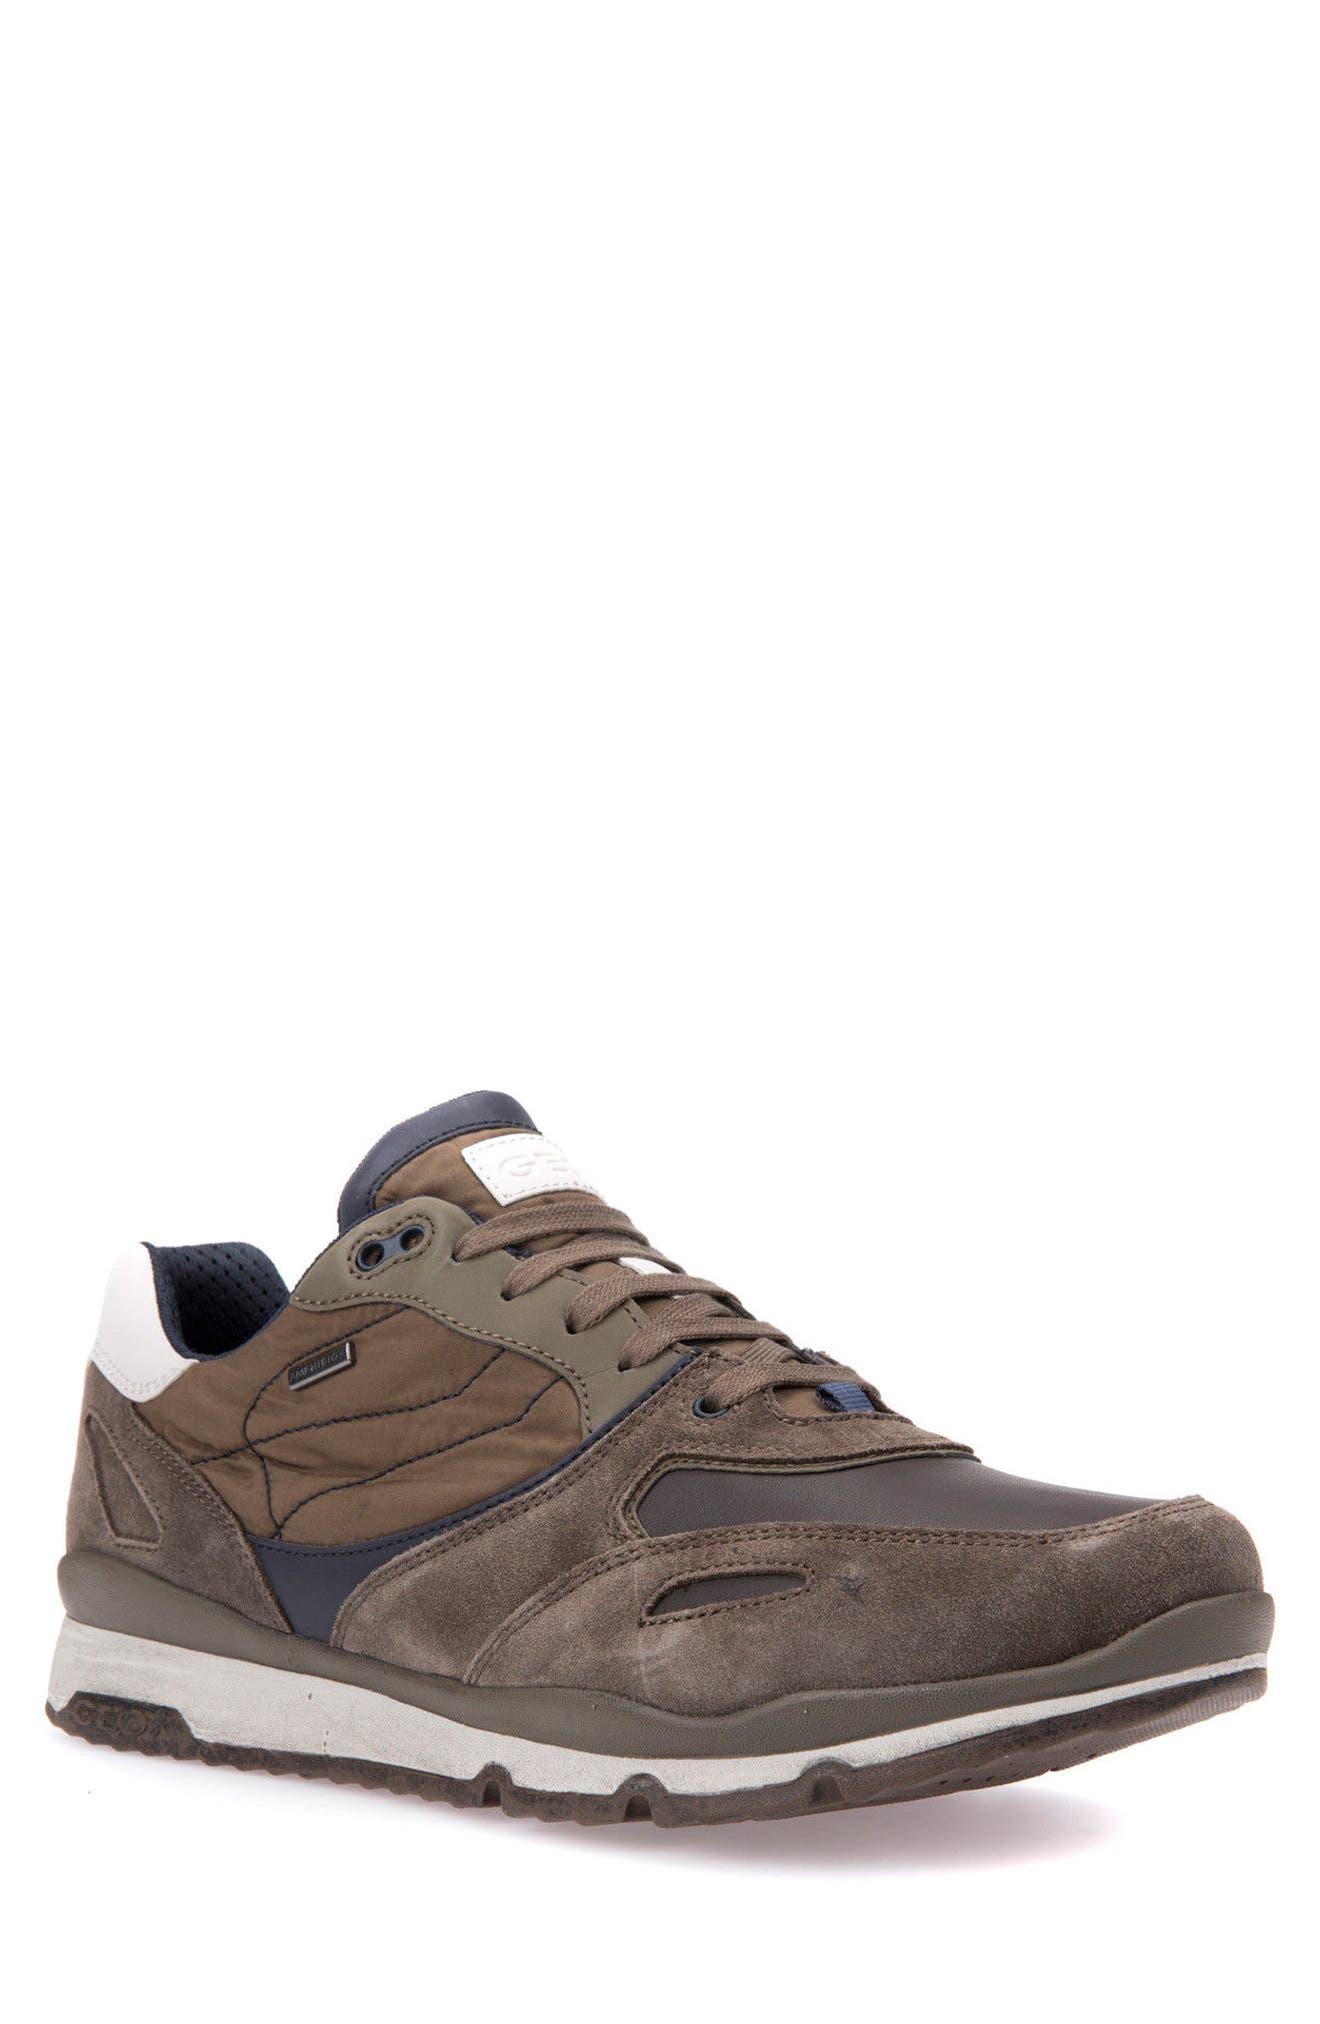 Sandro ABX Ambphibiox Waterproof Sneaker,                             Main thumbnail 1, color,                             Taupe